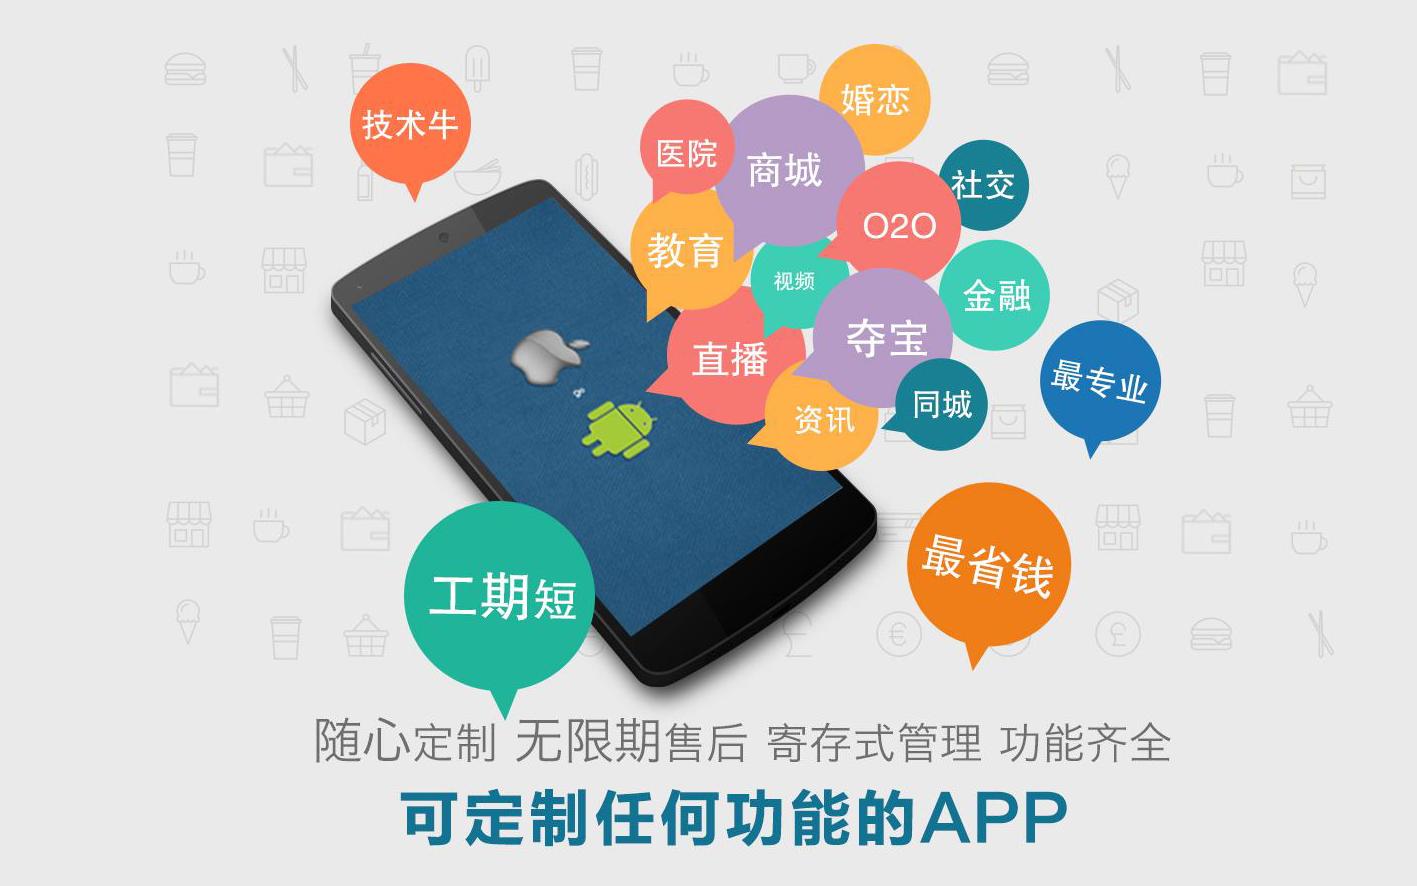 APP开发安卓苹果手机端|APP定制开发教育电商社交社区任务